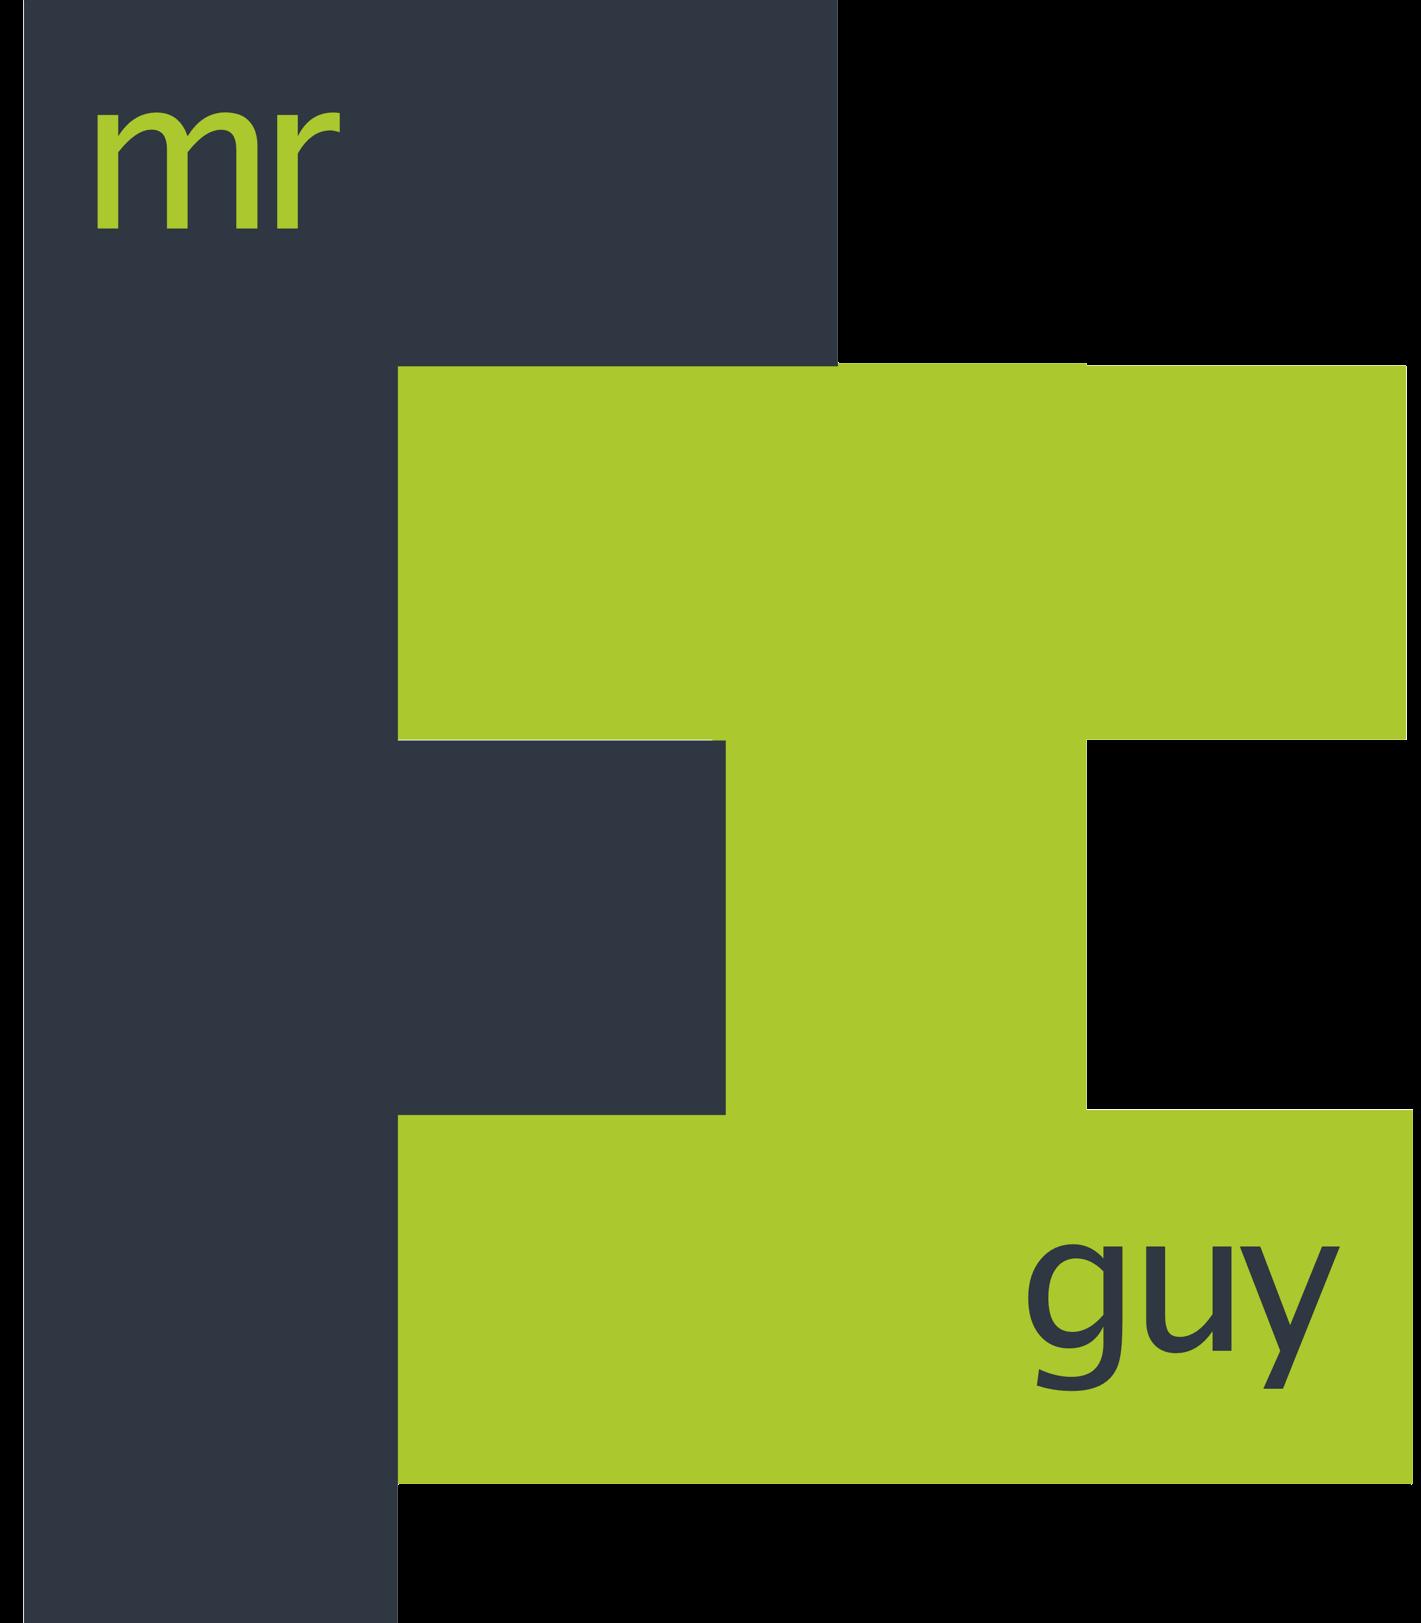 Mr. Fi Guy